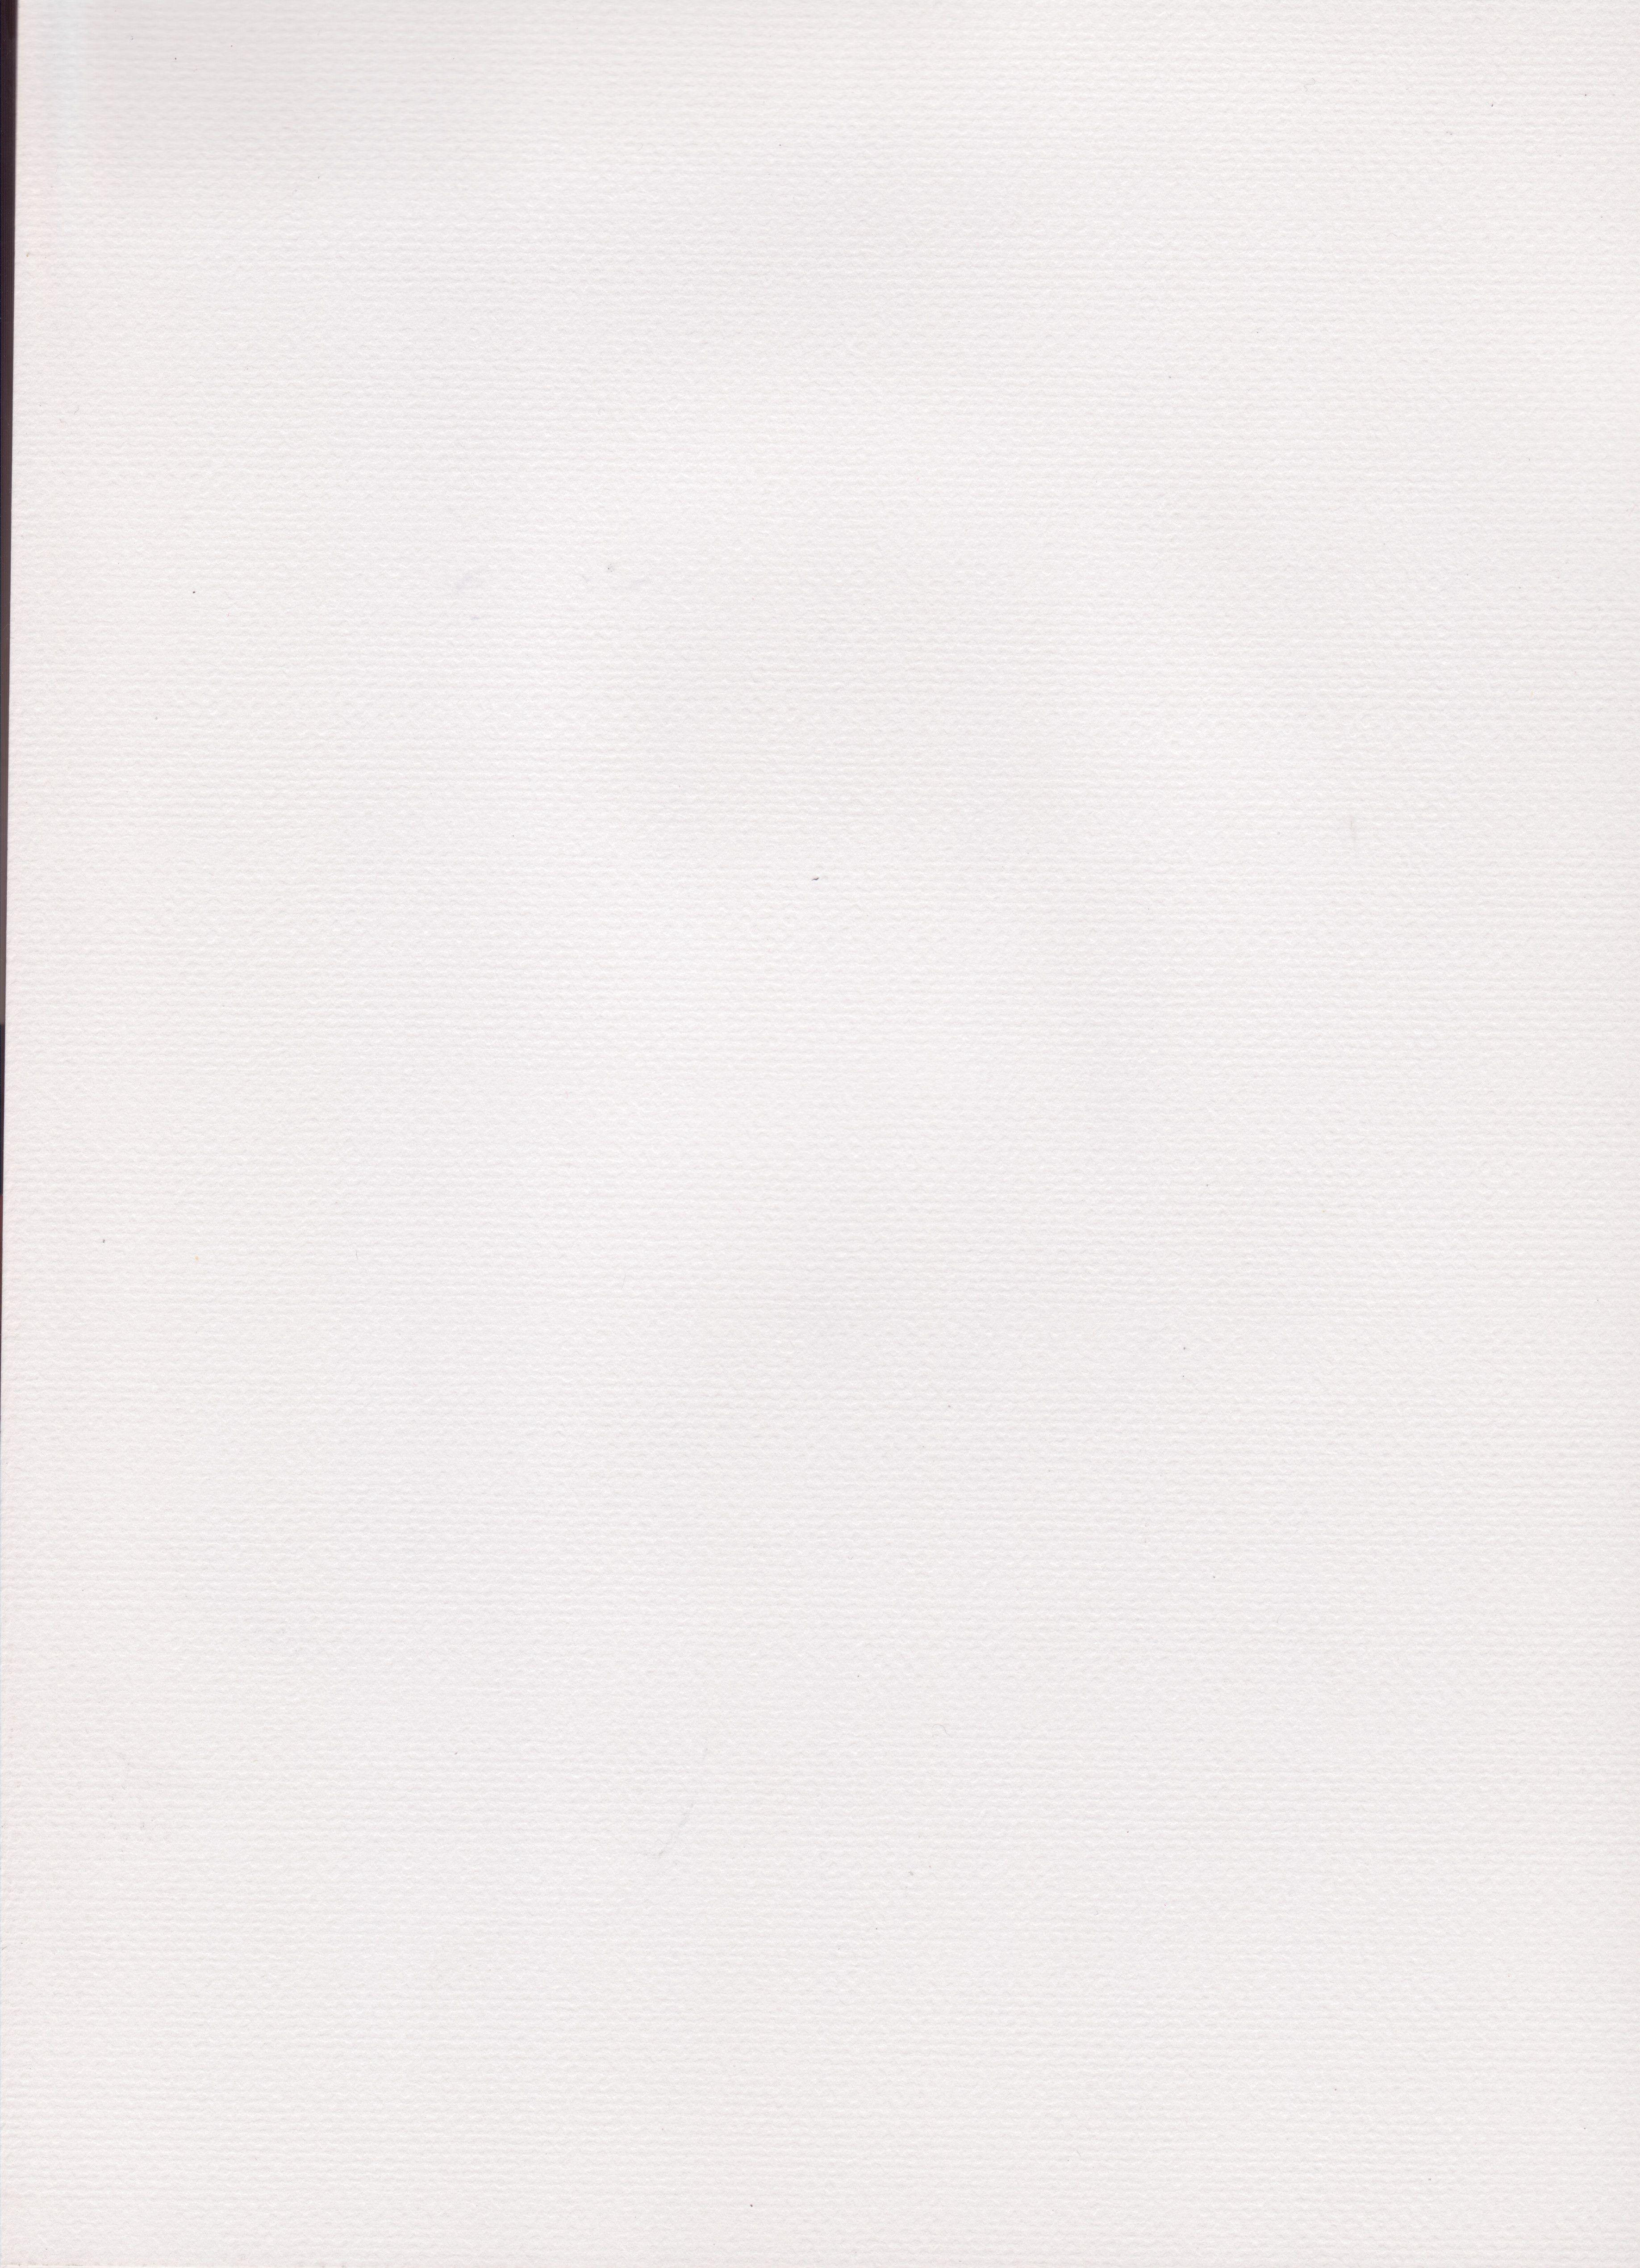 art_paper_by_emothic_stock.jpg (3673×5078